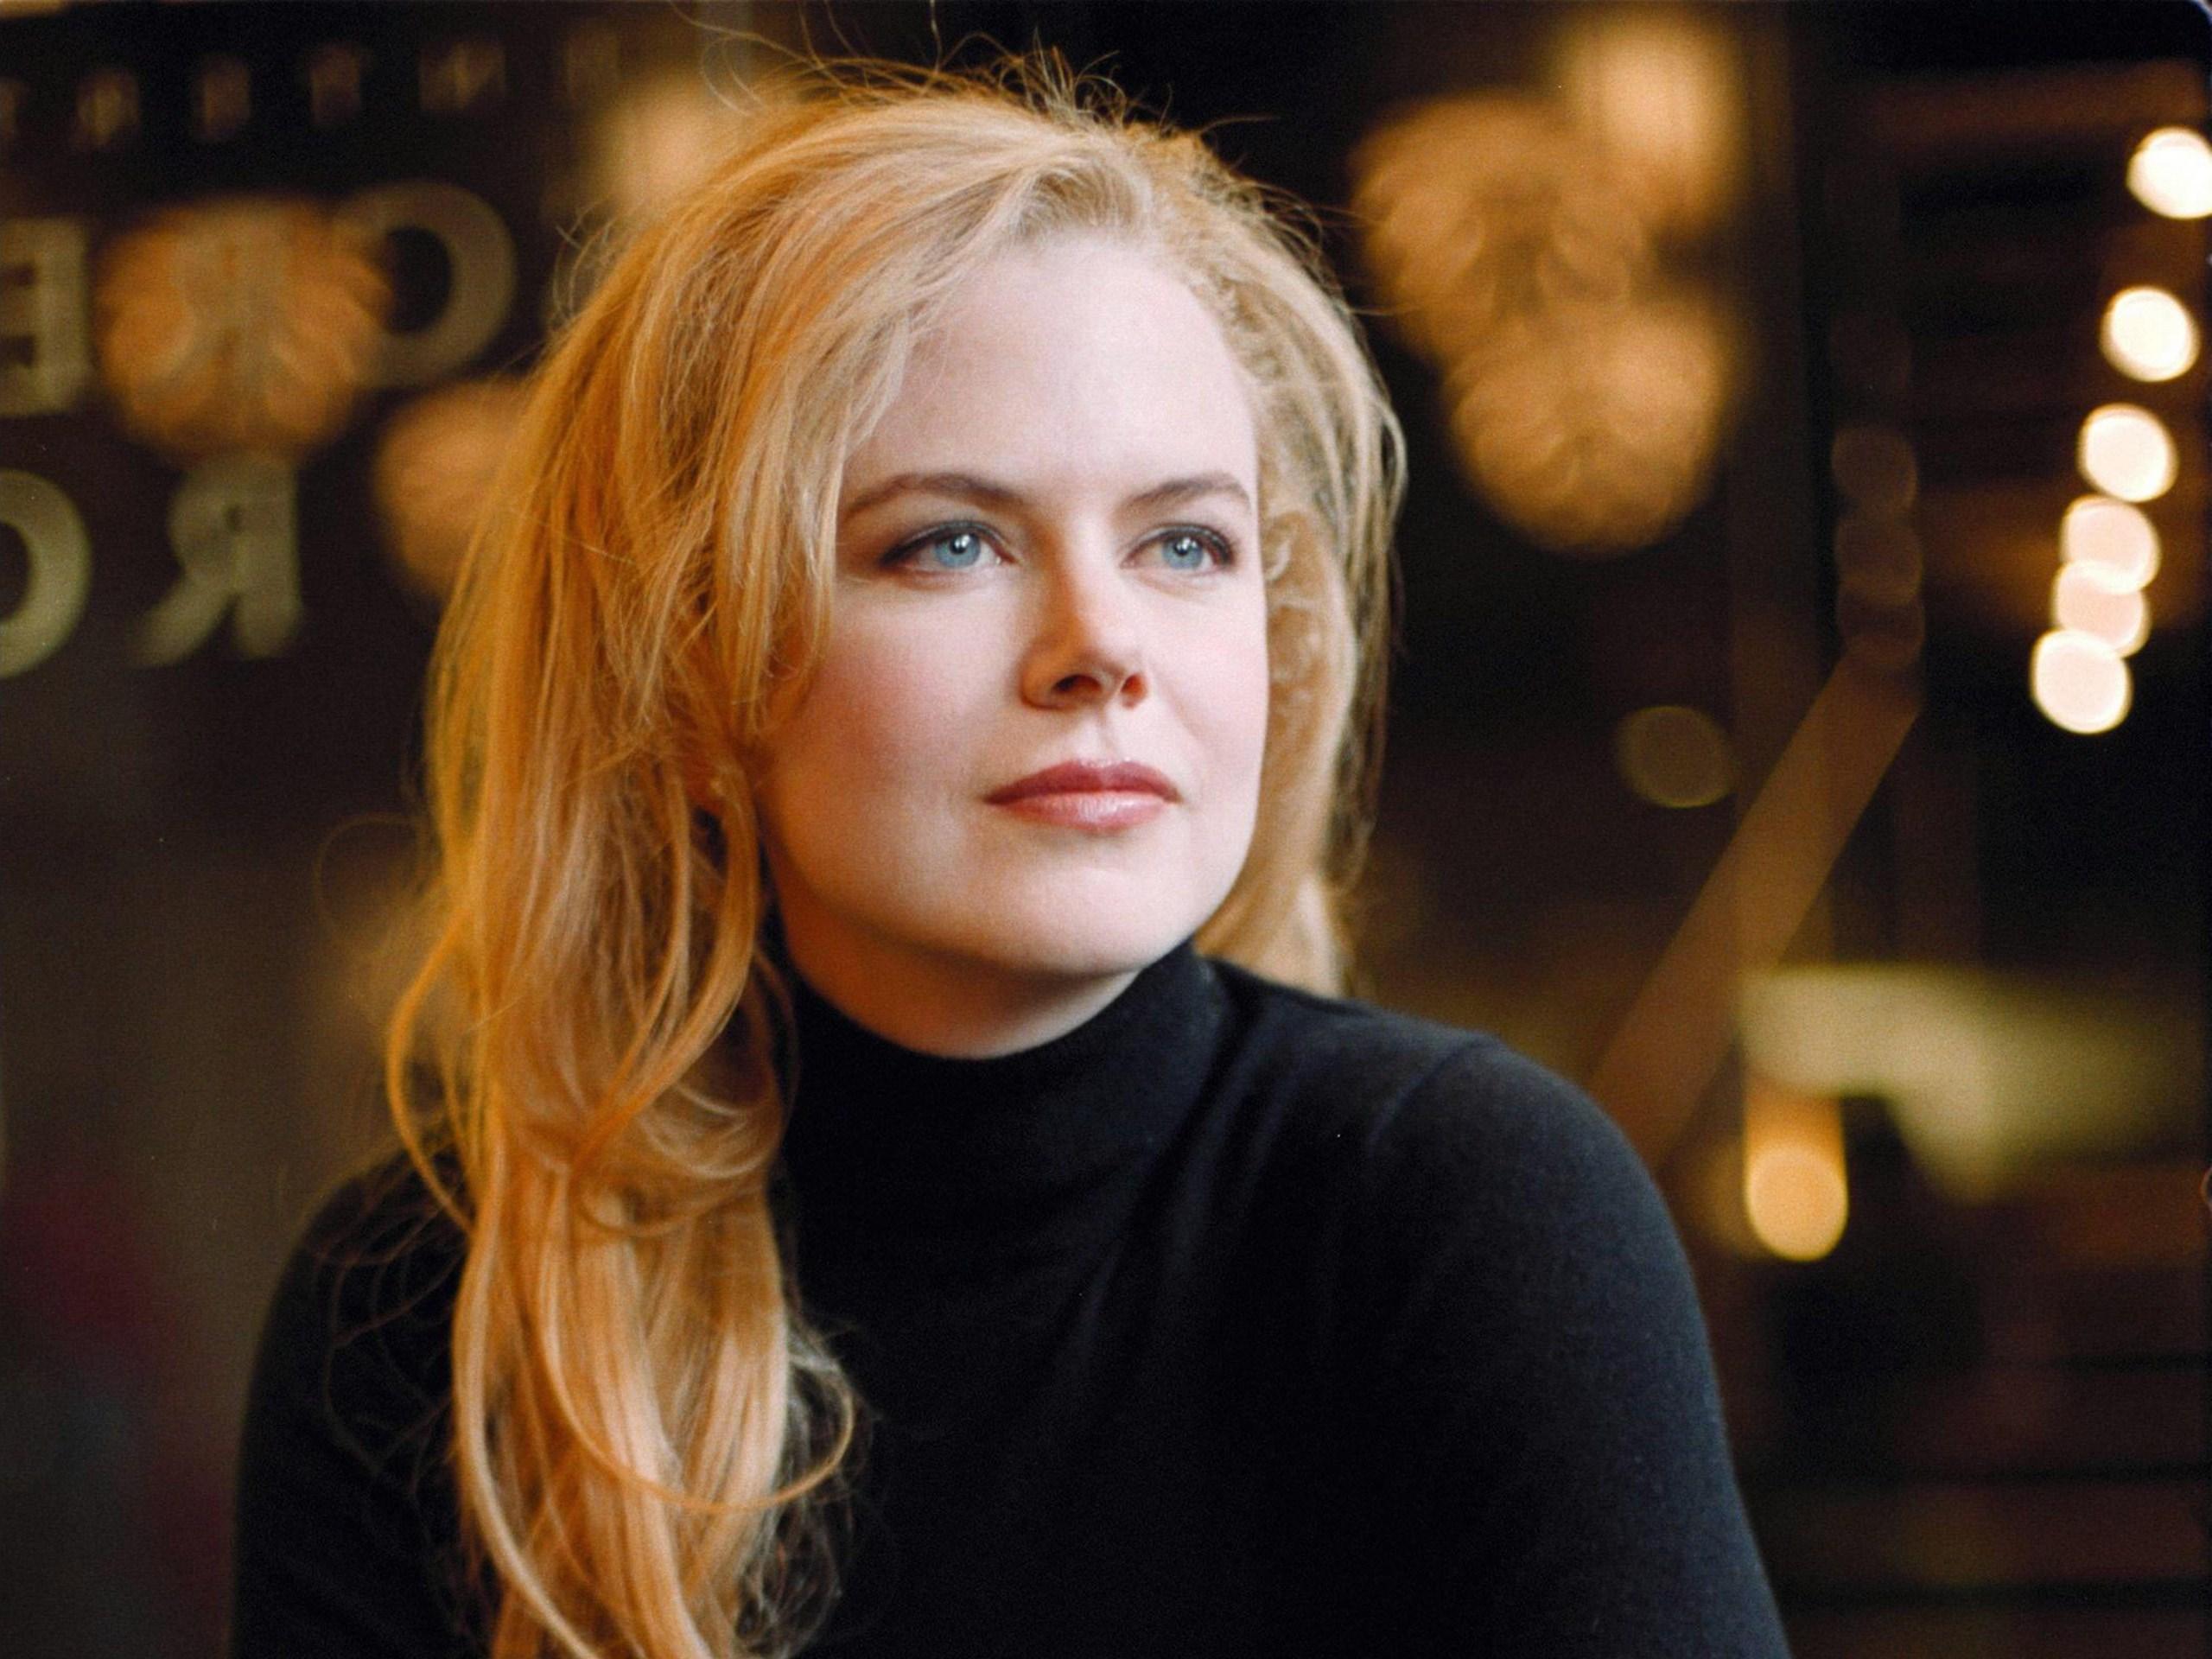 Nicole Kidman - 5.91